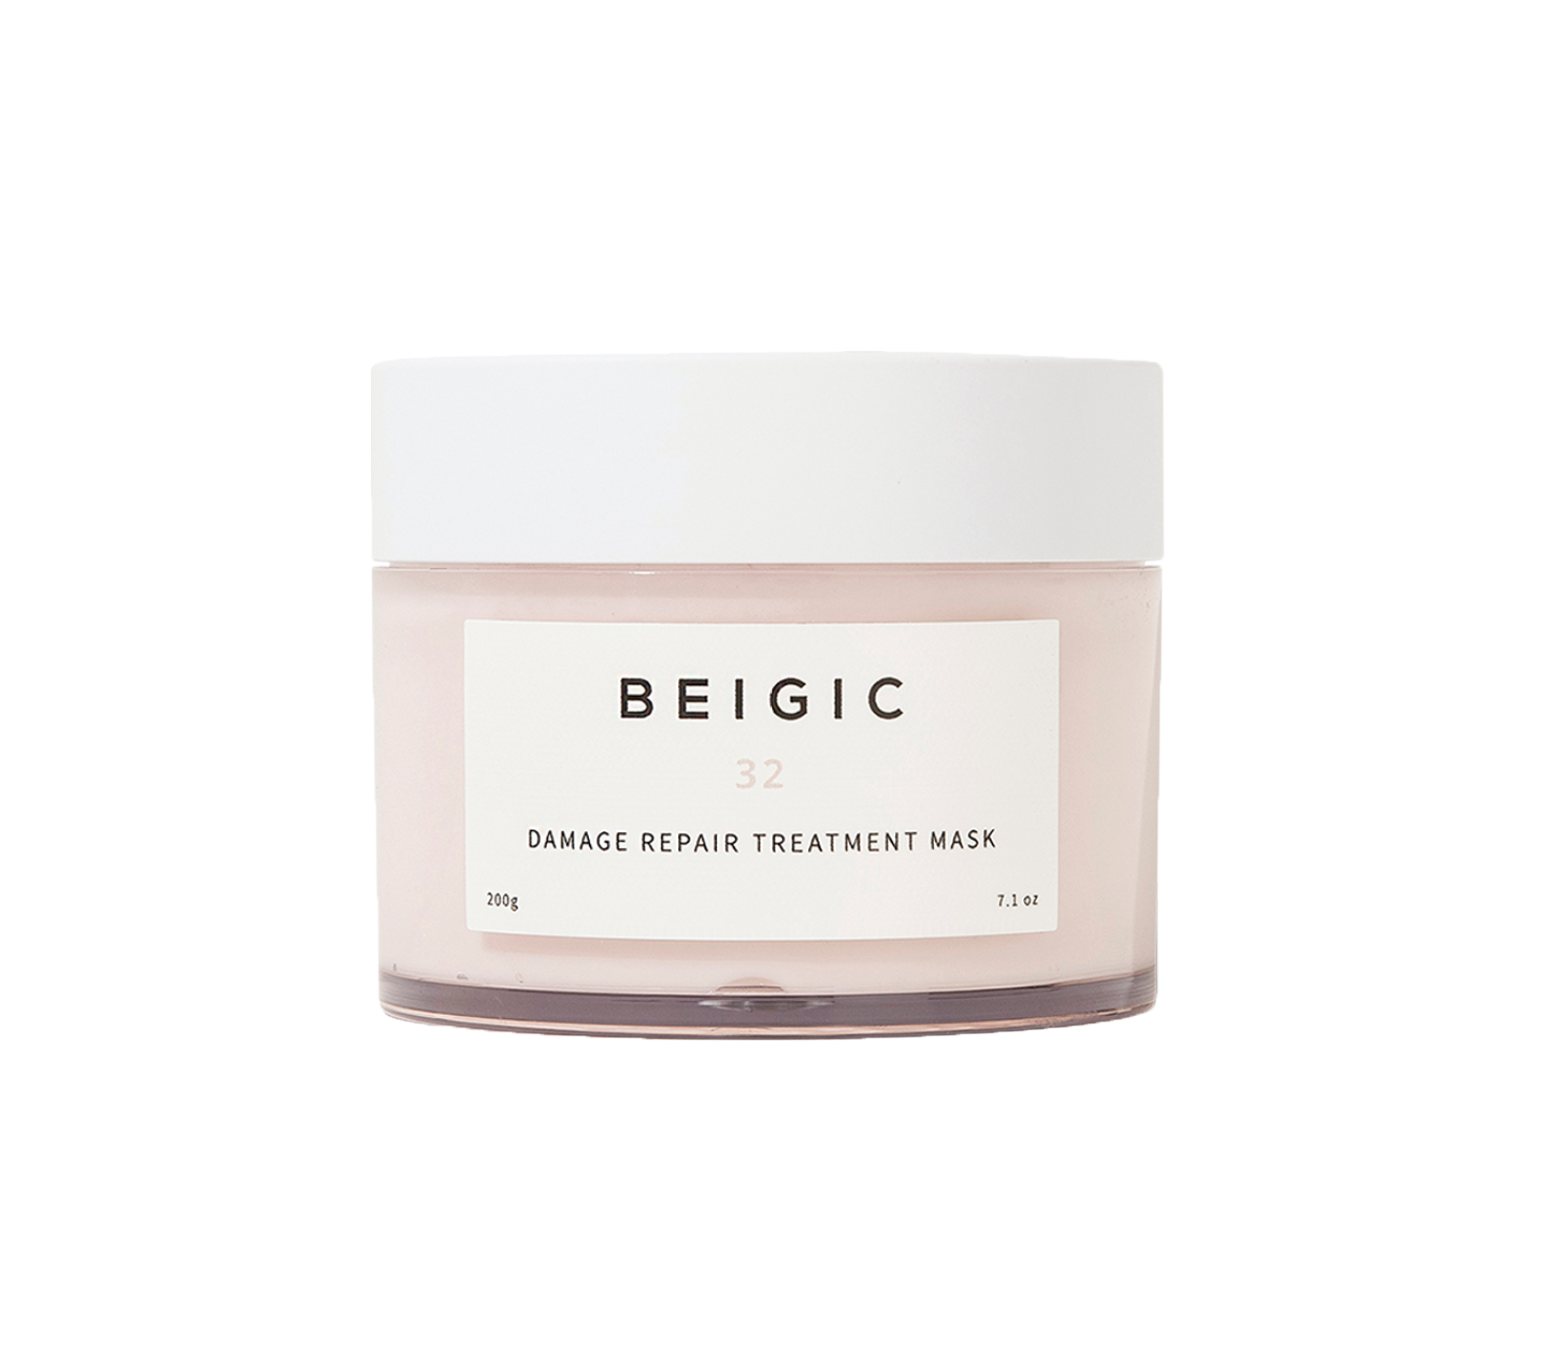 BEIGIC_damage-repair-treatment-mask